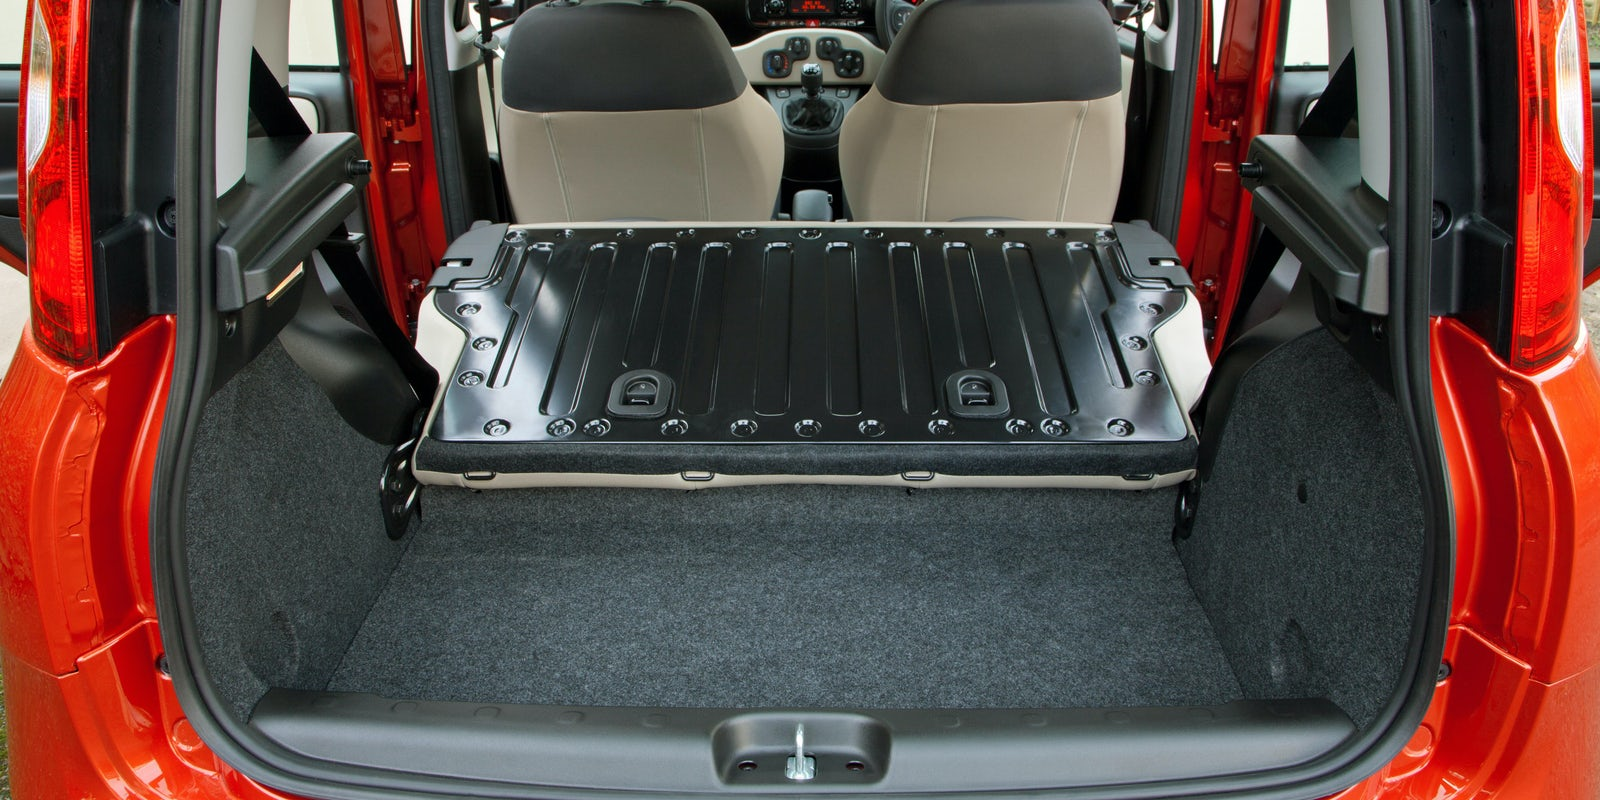 Fiat Panda interior and infotainment | carwow